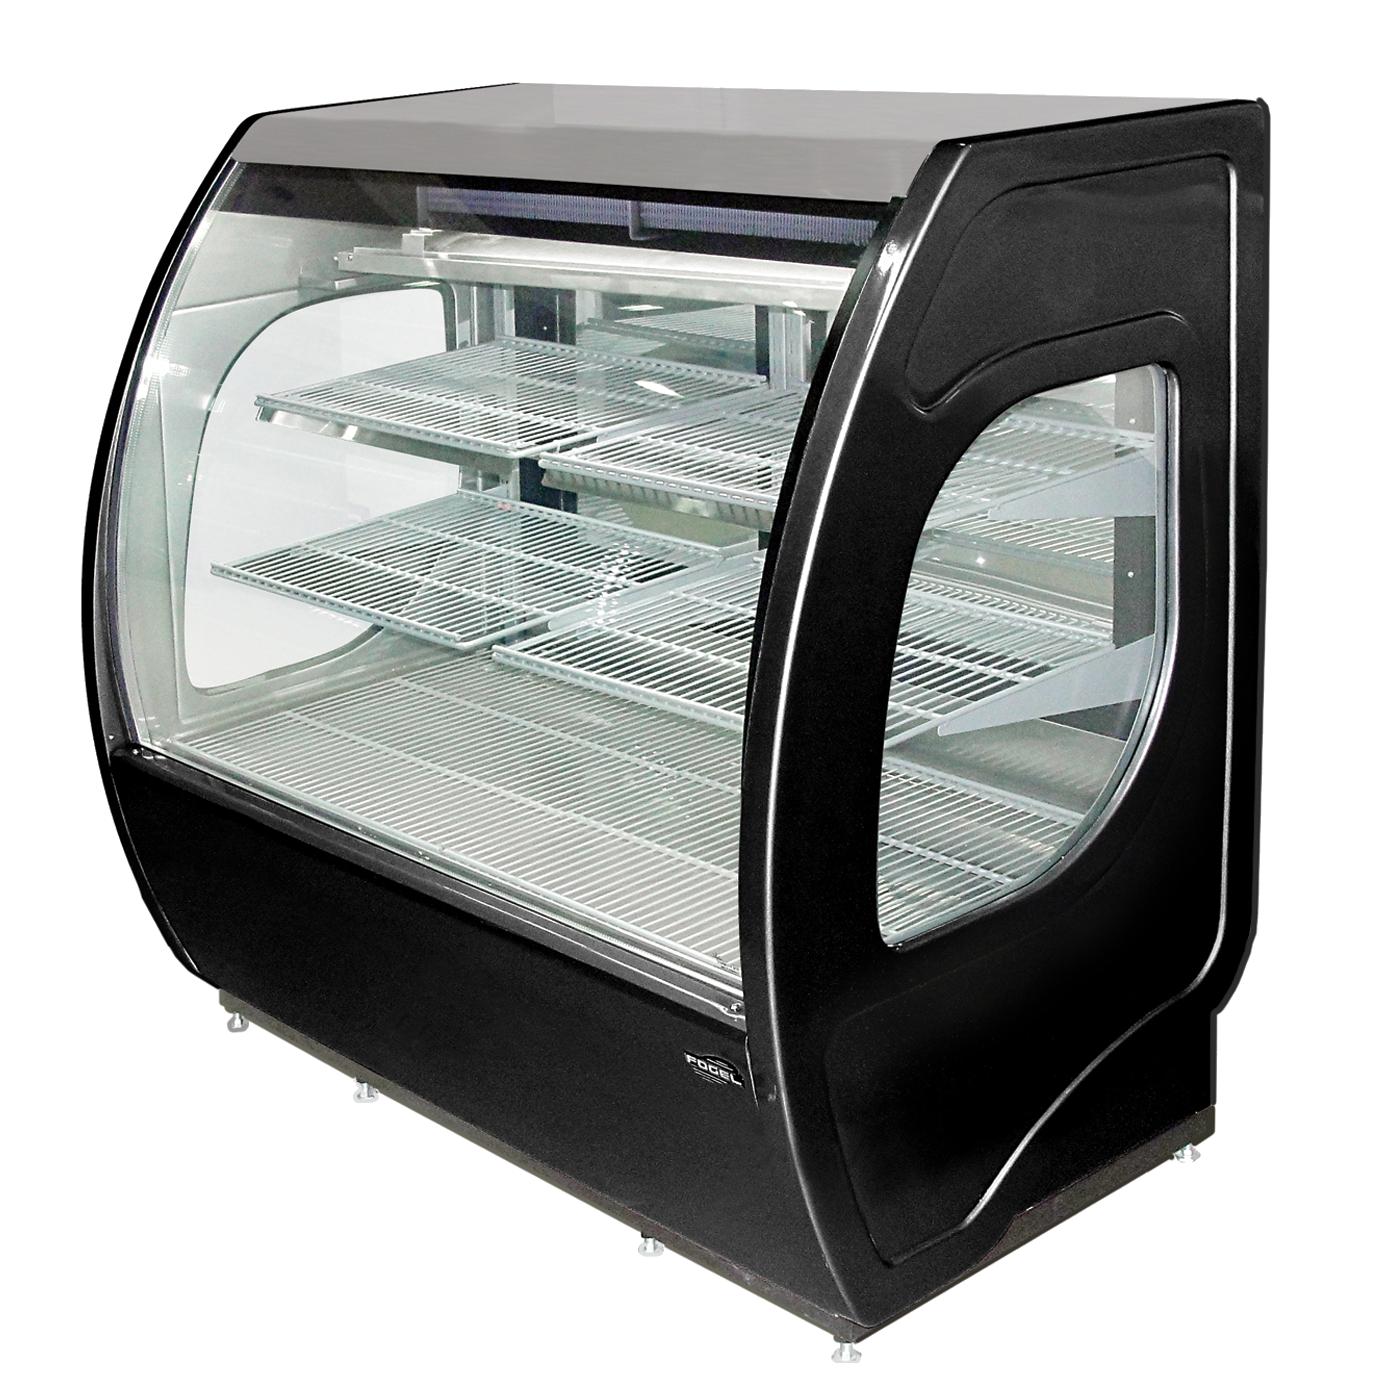 ELITE-4-DC-B Fogel USA display case, refrigerated deli